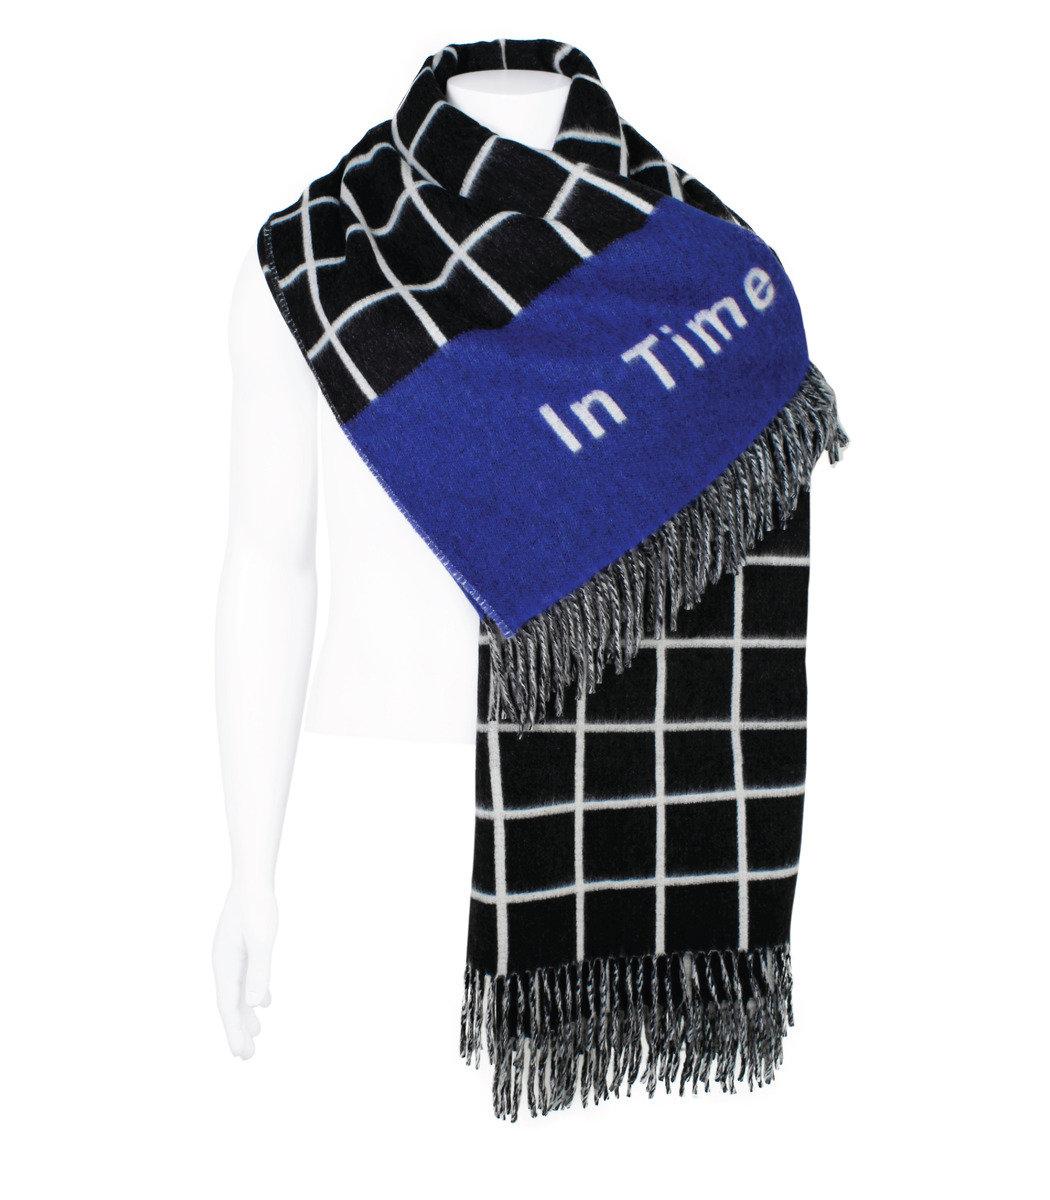 Lifw future blye 頸巾